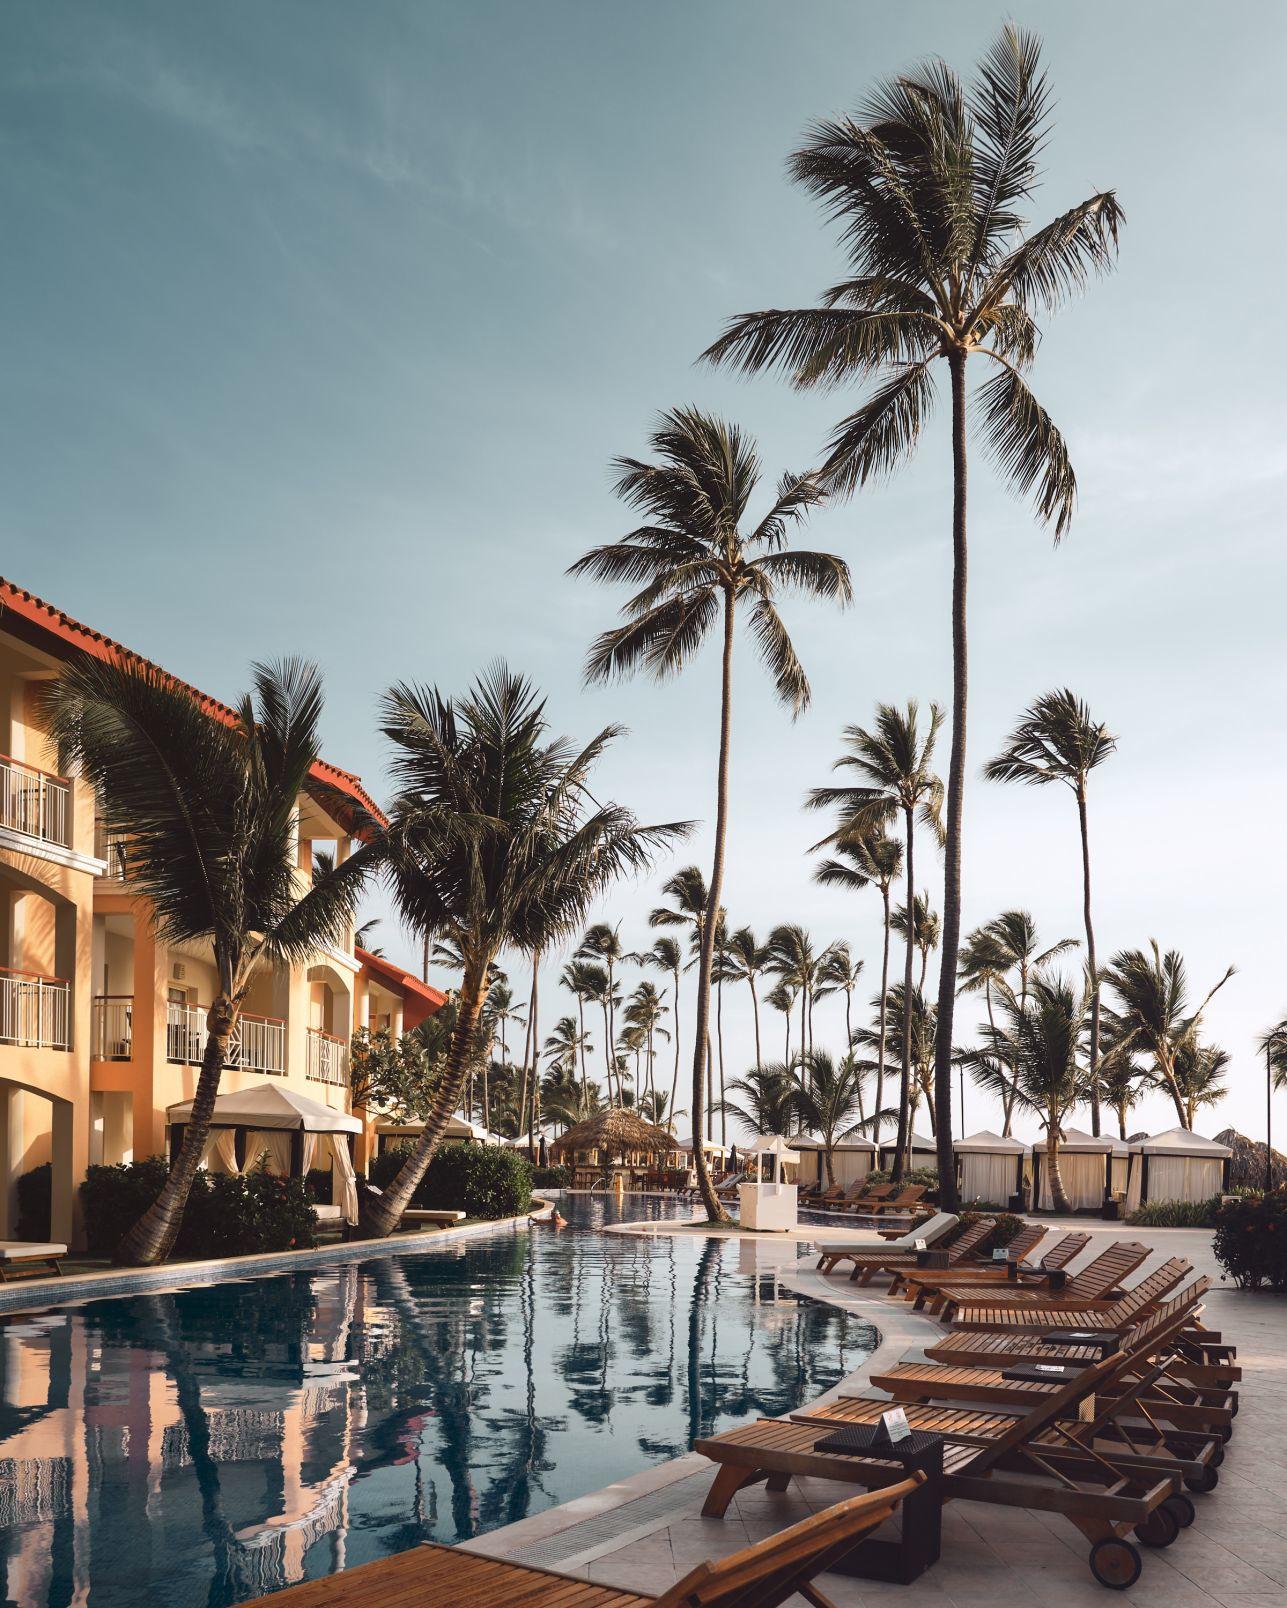 Majestic Resort DR by christian-lambert-1345075-unsplash.jpg